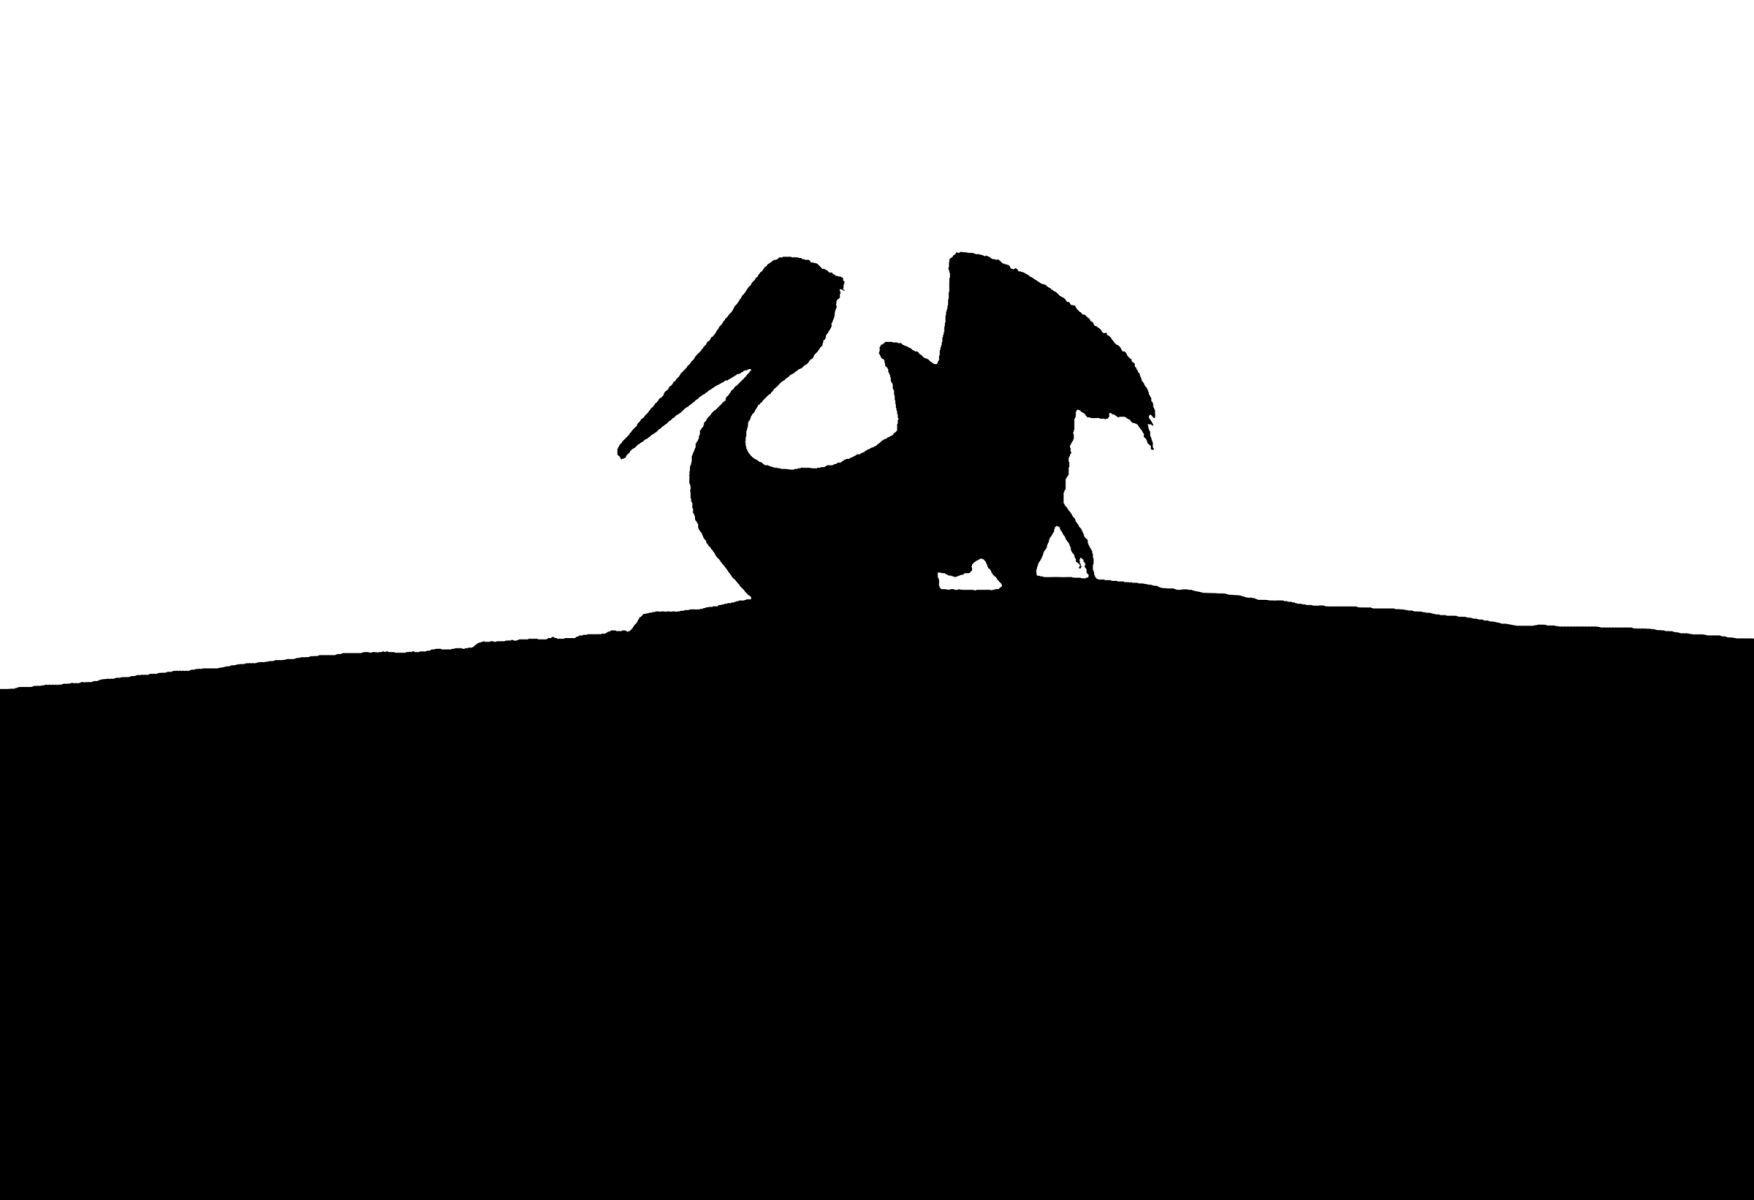 Bird Series #21 - Pelican Dragon ©2015 L. Aviva Diamond